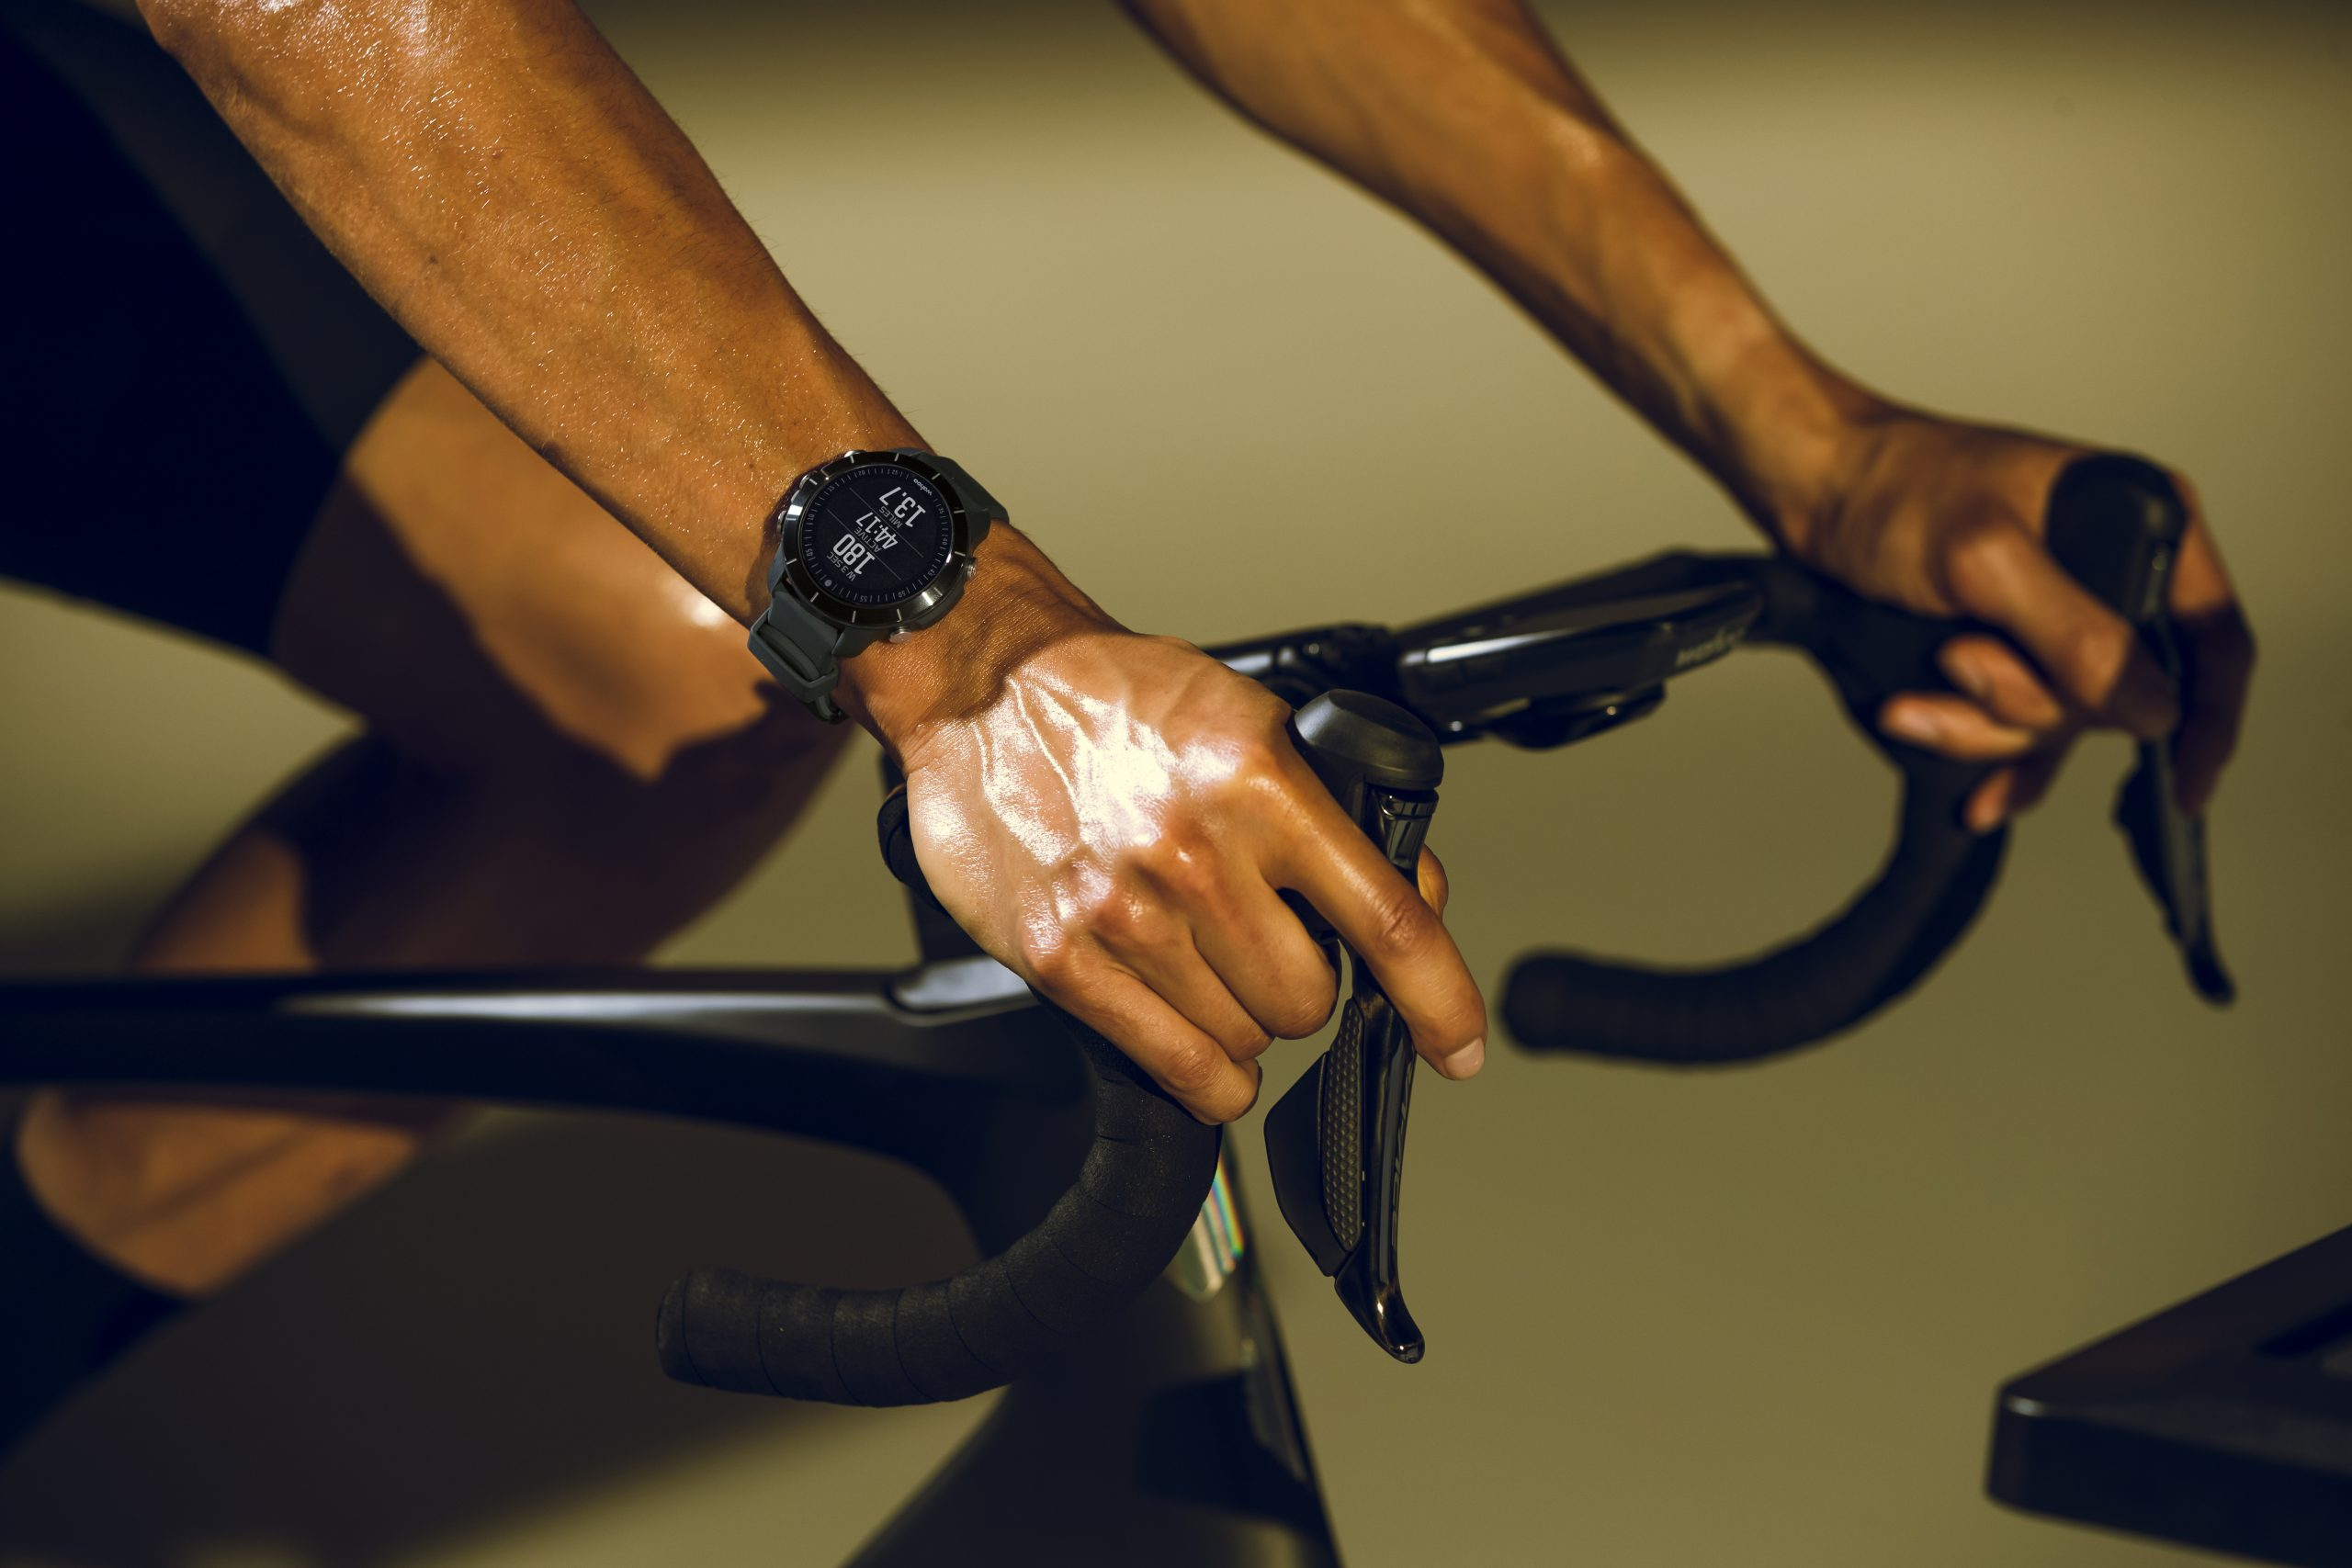 All-Diabetes Pro Cycling Team | Type 1 Diabetes | Team Novo Nordisk